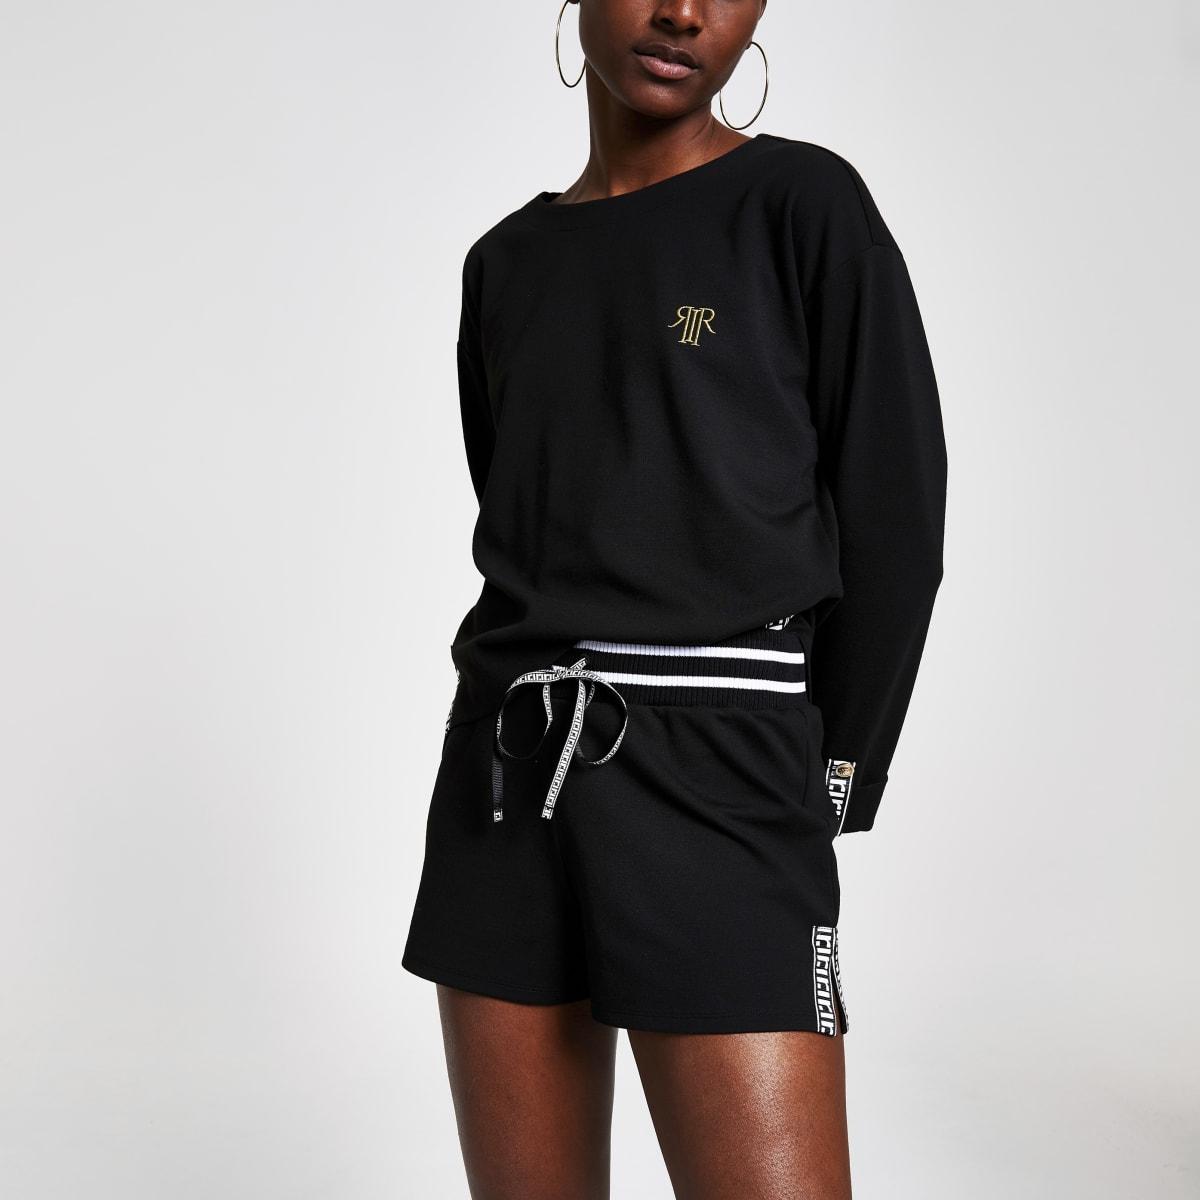 Black RI runner shorts